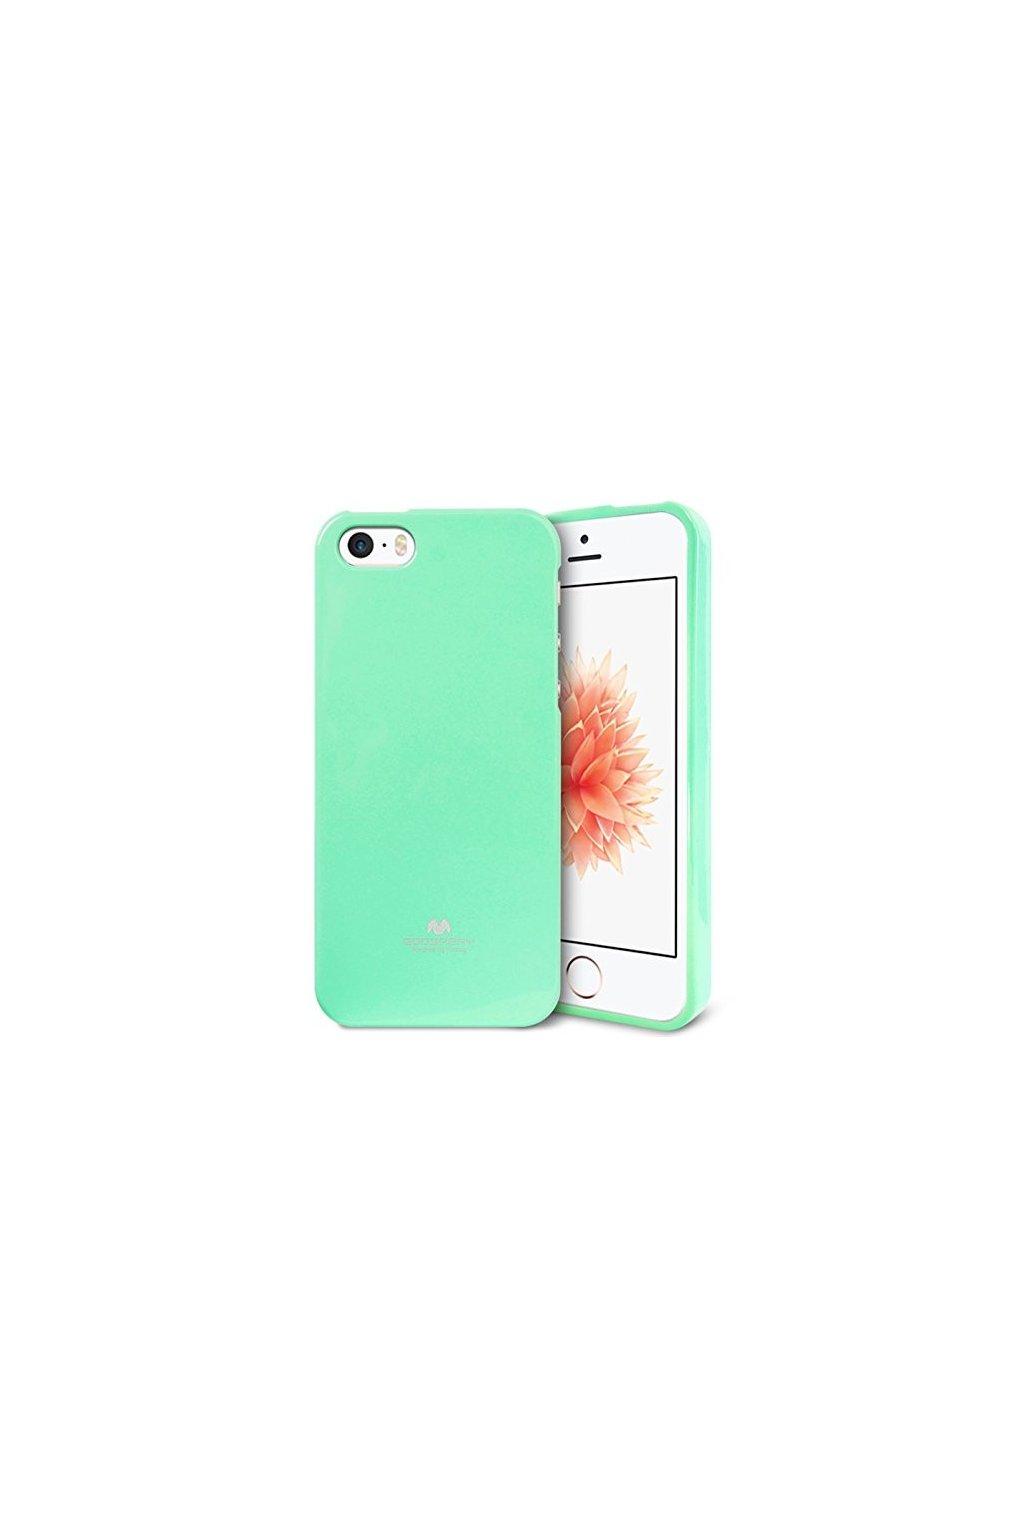 1691 mercury siliconovy kryt iphone 5s se mint